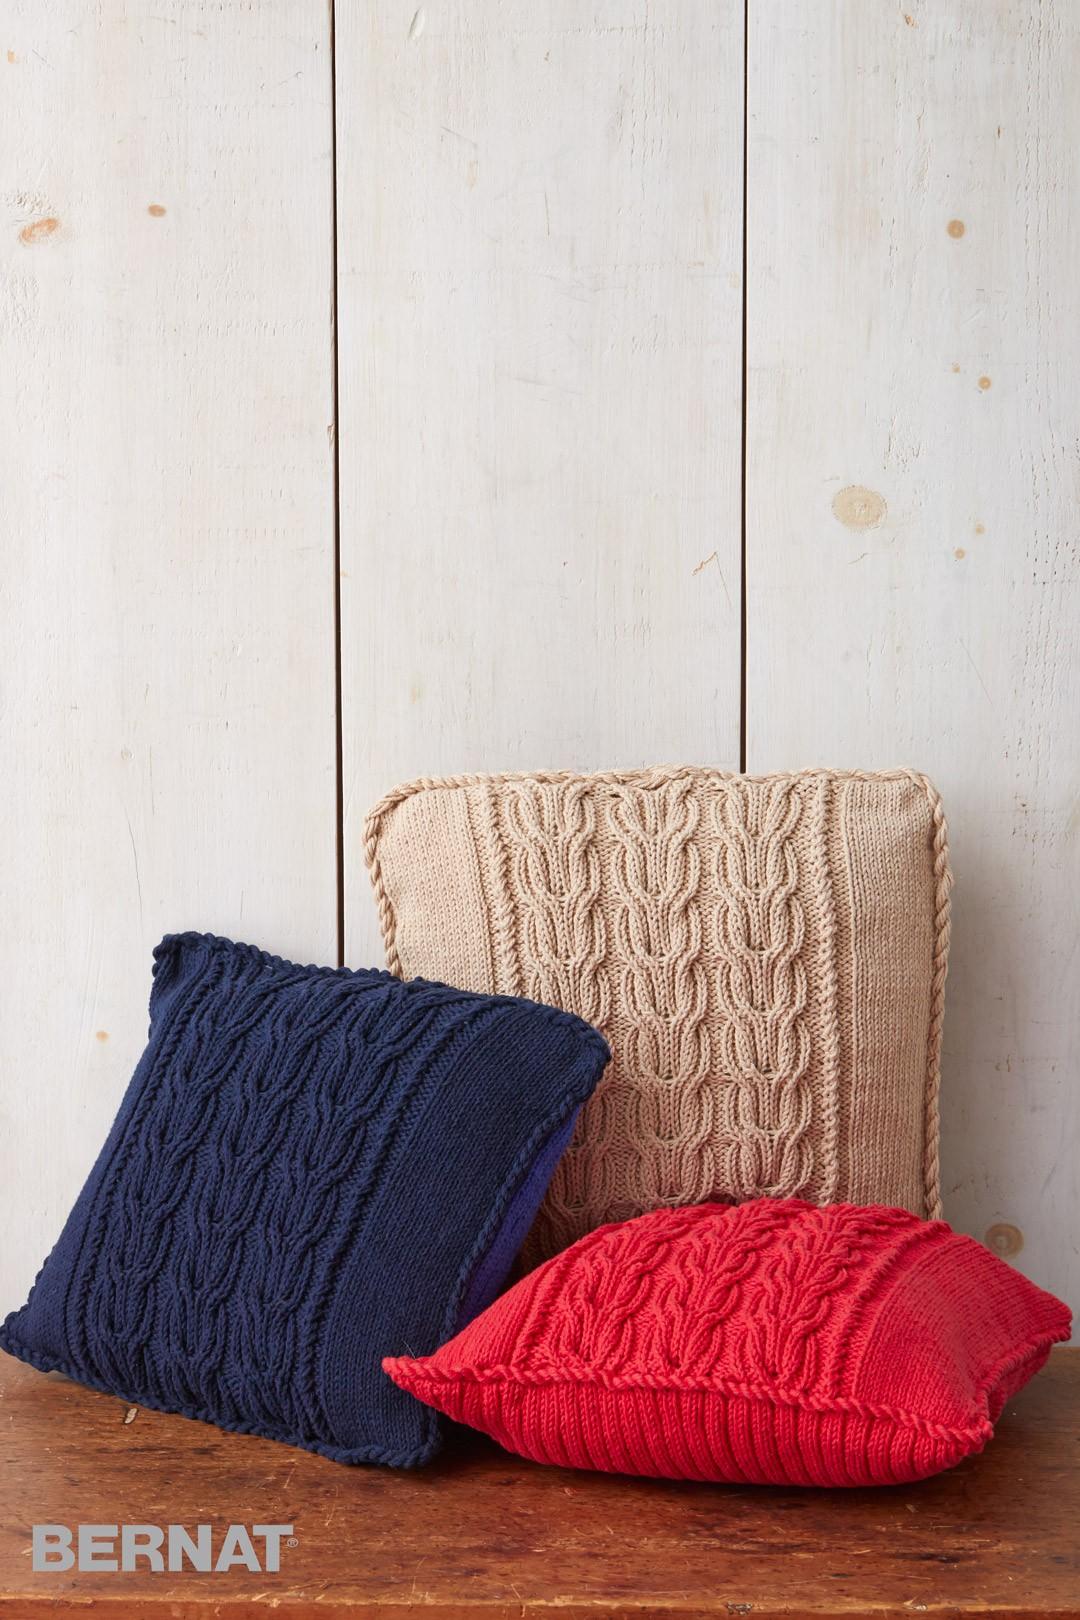 bernat patterns cable knit trio pillows. bernat pydrudo